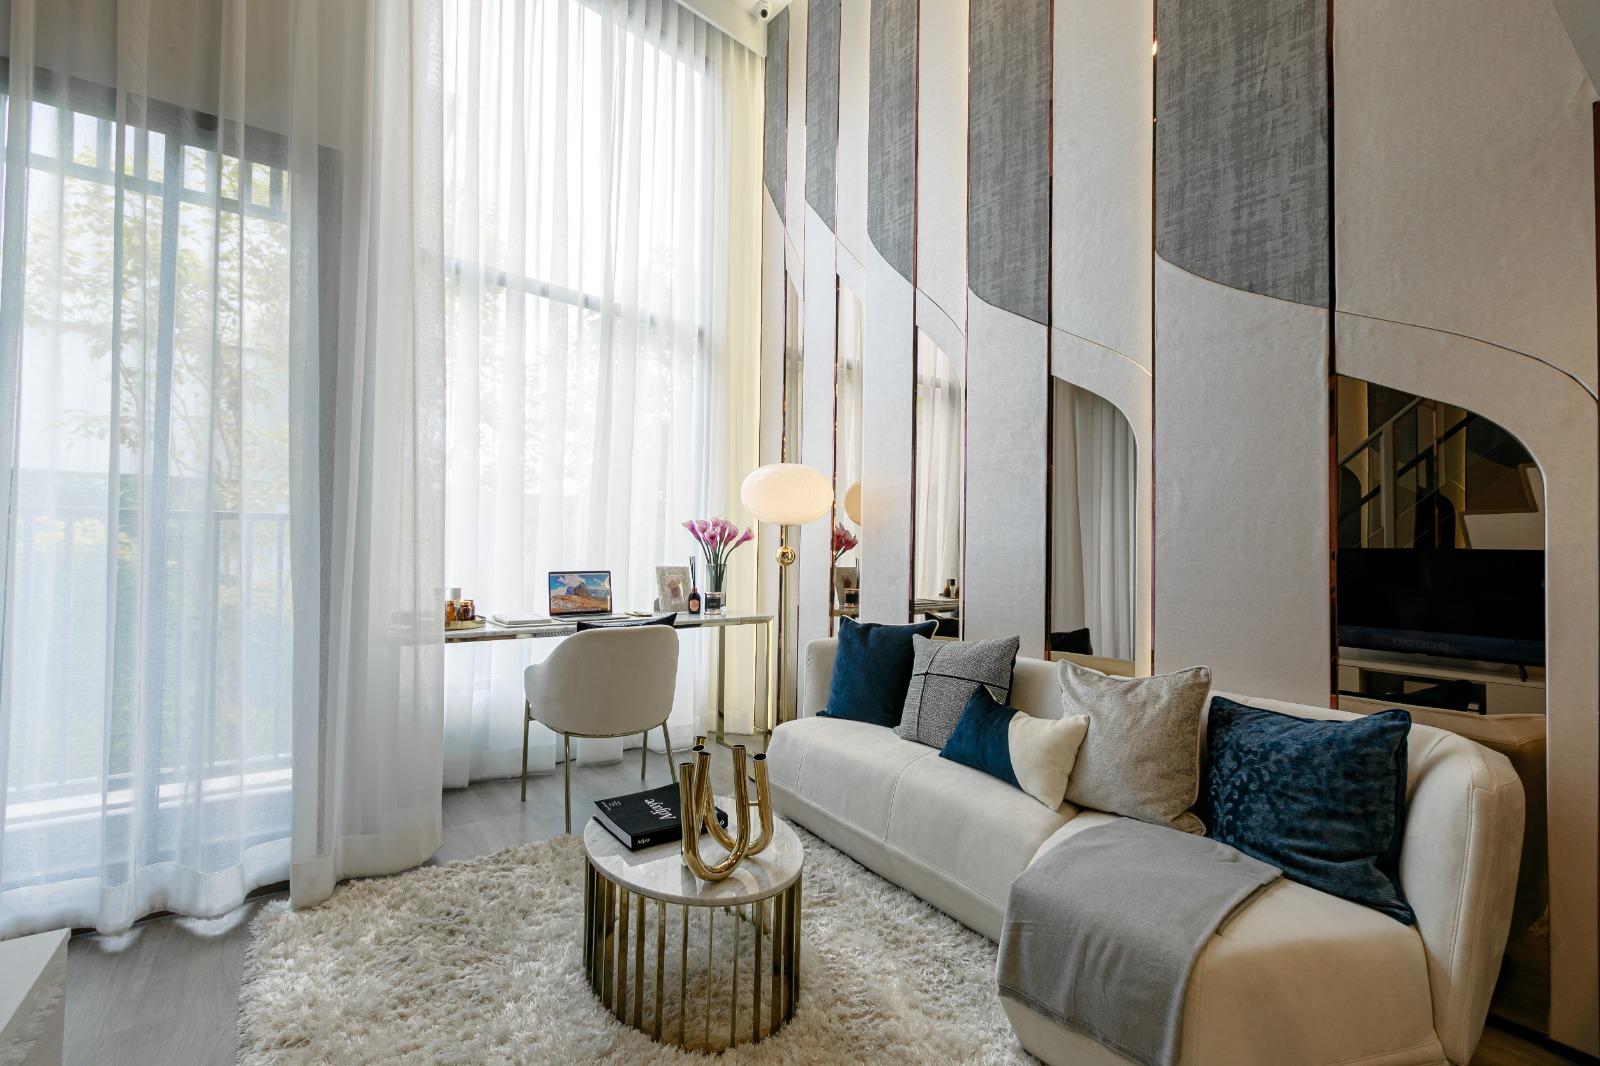 SOHO Bangkok Ratchada是該區是專業人士聚居地,投資旅居皆宜,預計每年平均租賃回報6%*